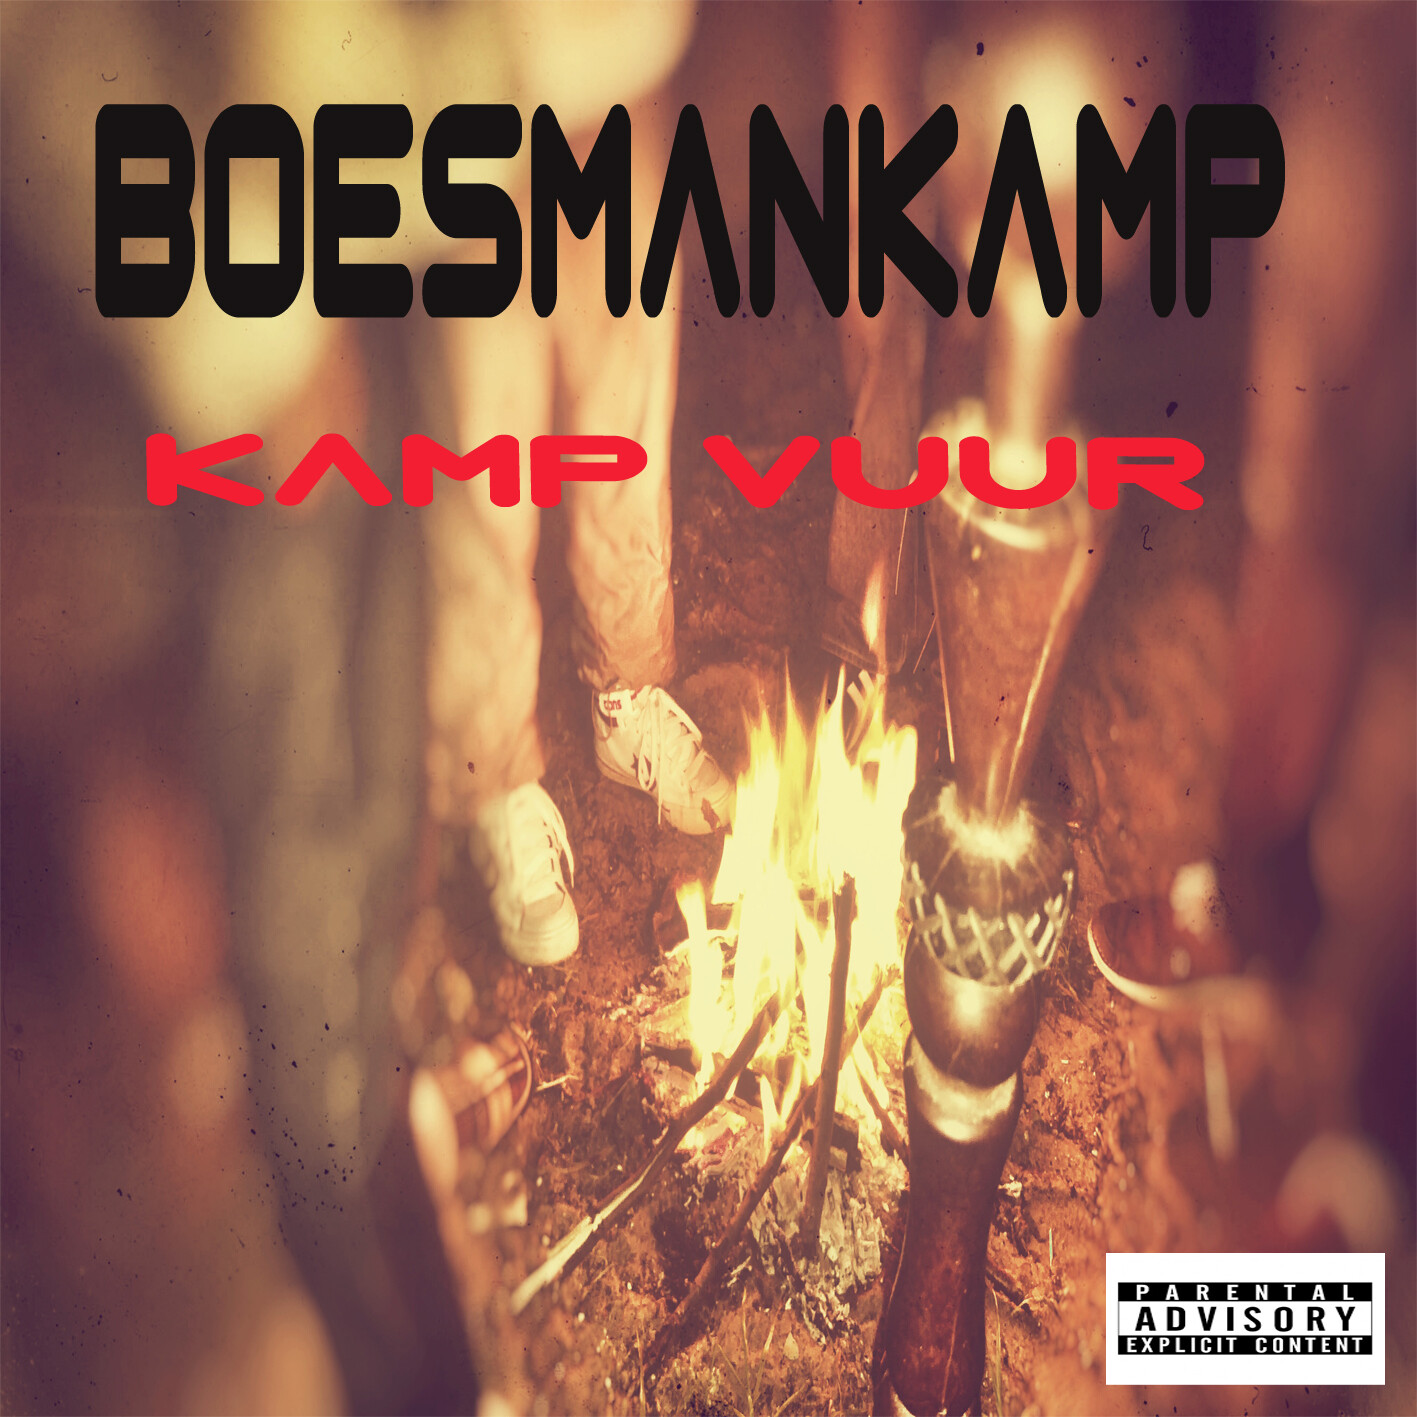 Boesmankamp